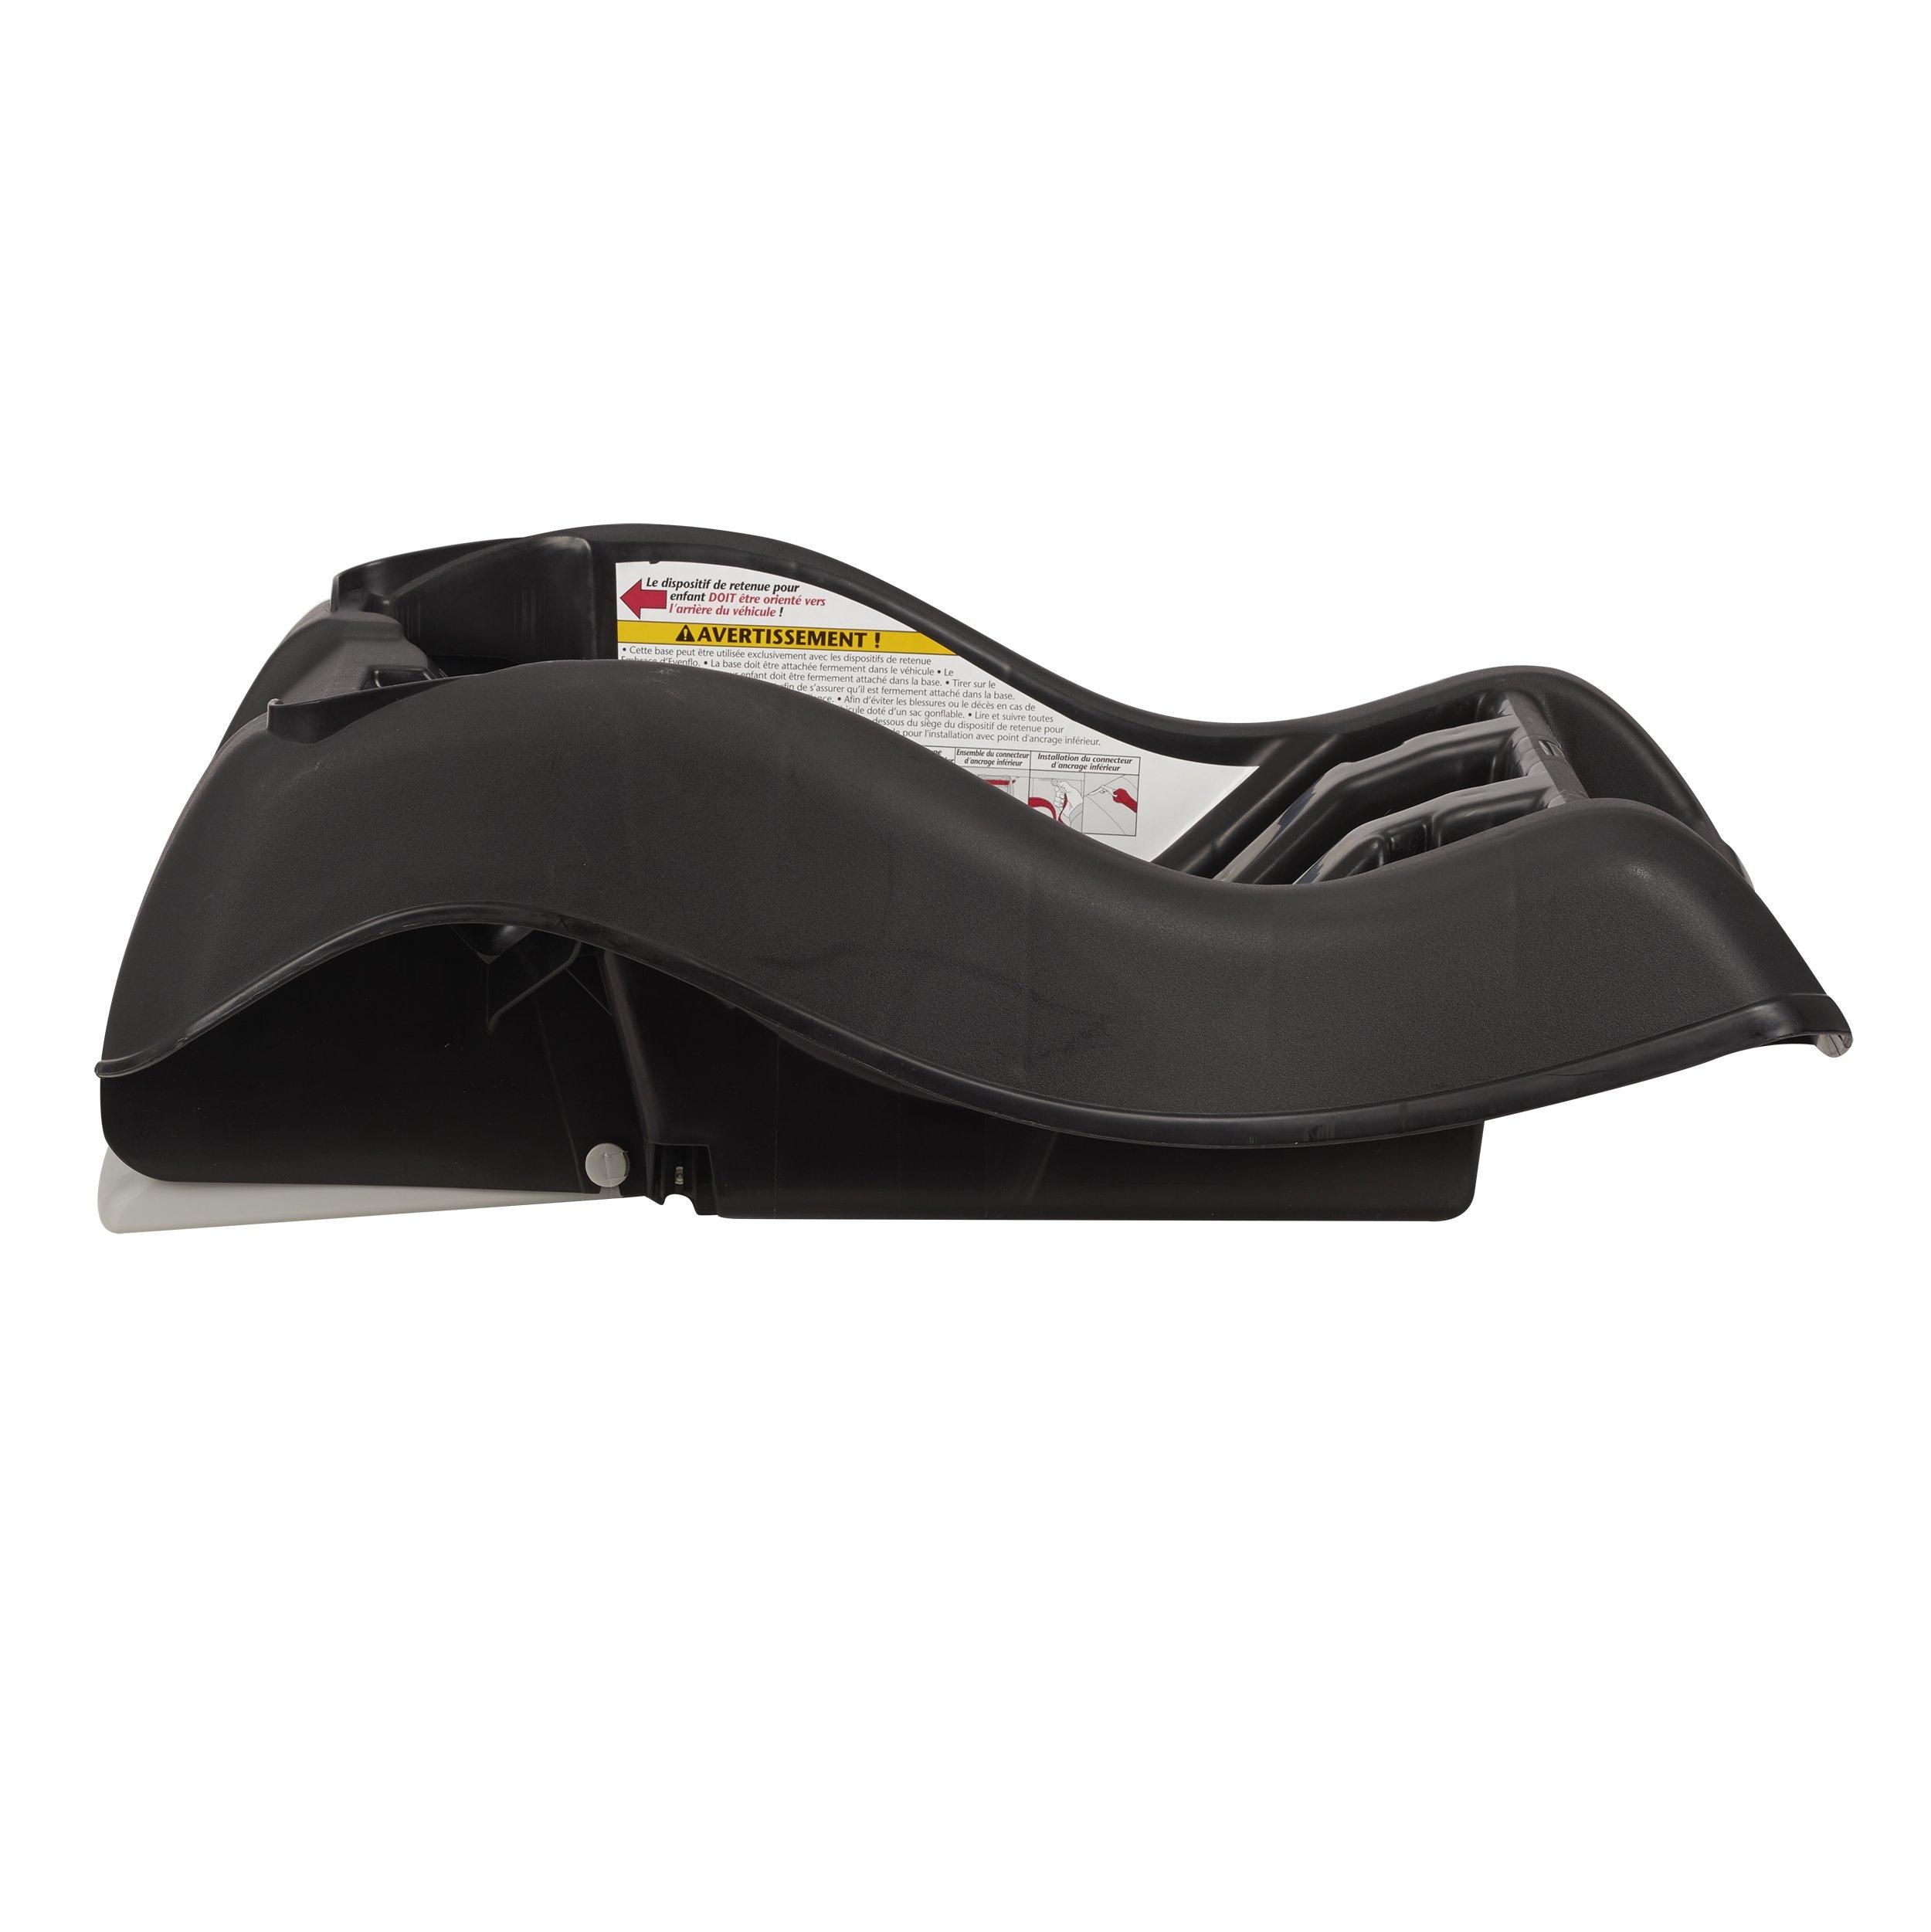 Evenflo Embrace Infant Car Seat Base, Black 885124282576